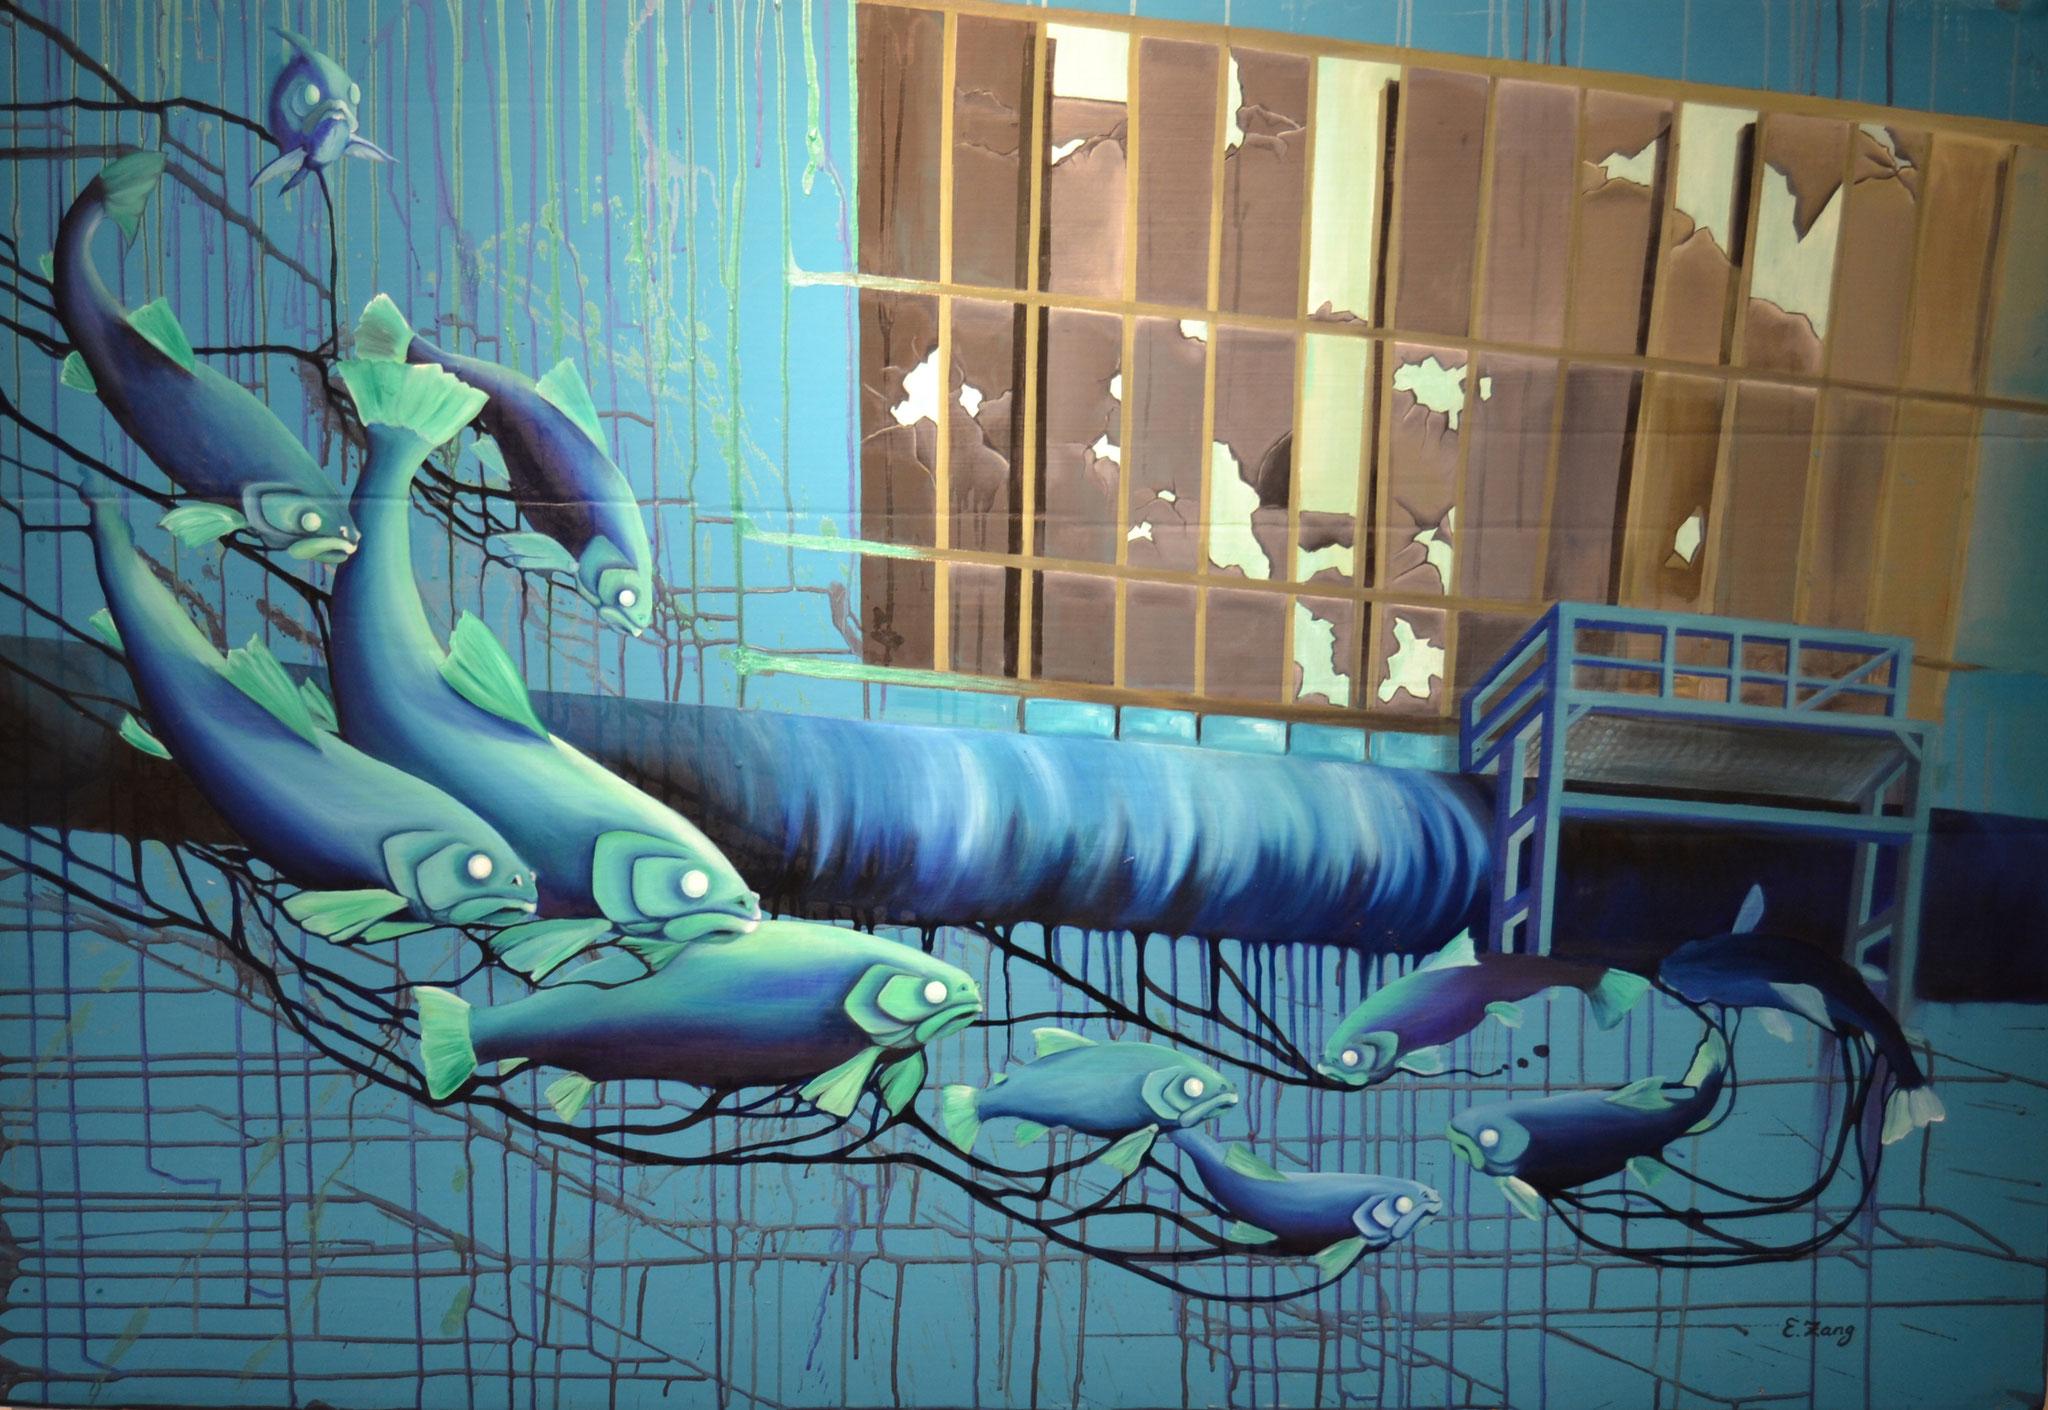 Floating Industry, Öl auf Recyclinggrund, 110x180 cm